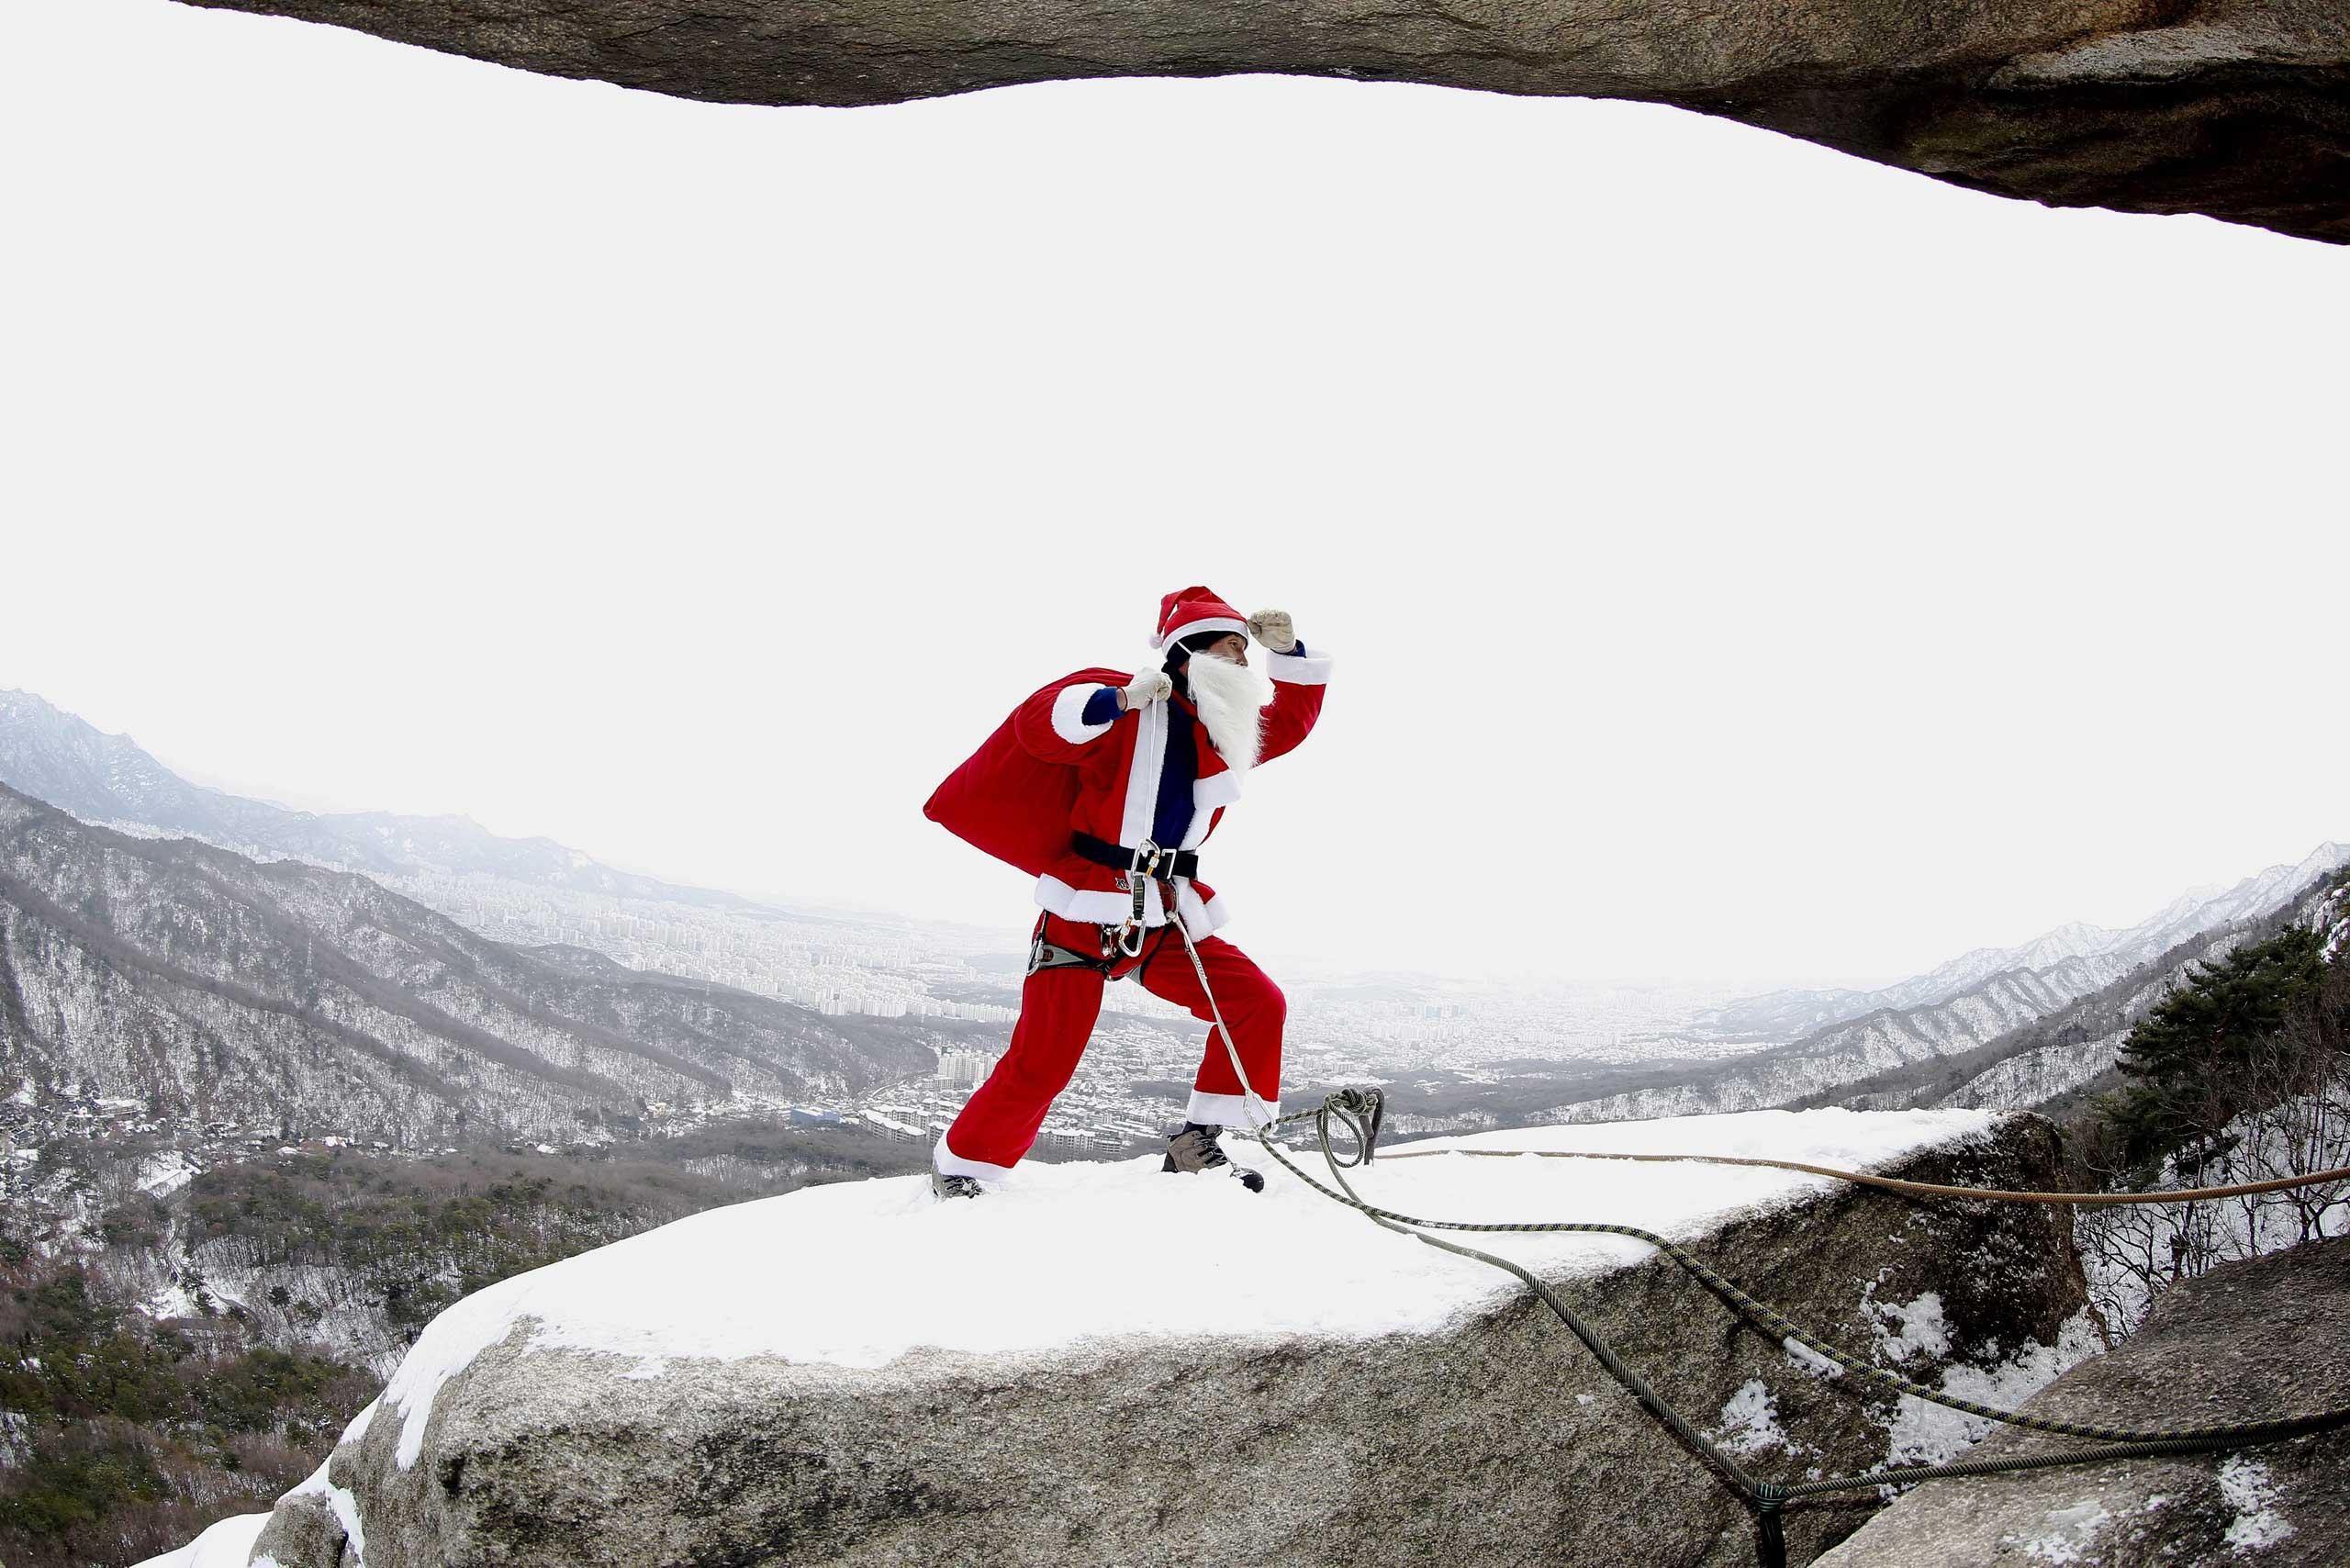 Kim Chang-Gon dressed as Santa Claus rock-climbs during an event marking the Christmas holiday season on Buckhan mountain near Seoul, South Korea on Dec. 21, 2014.